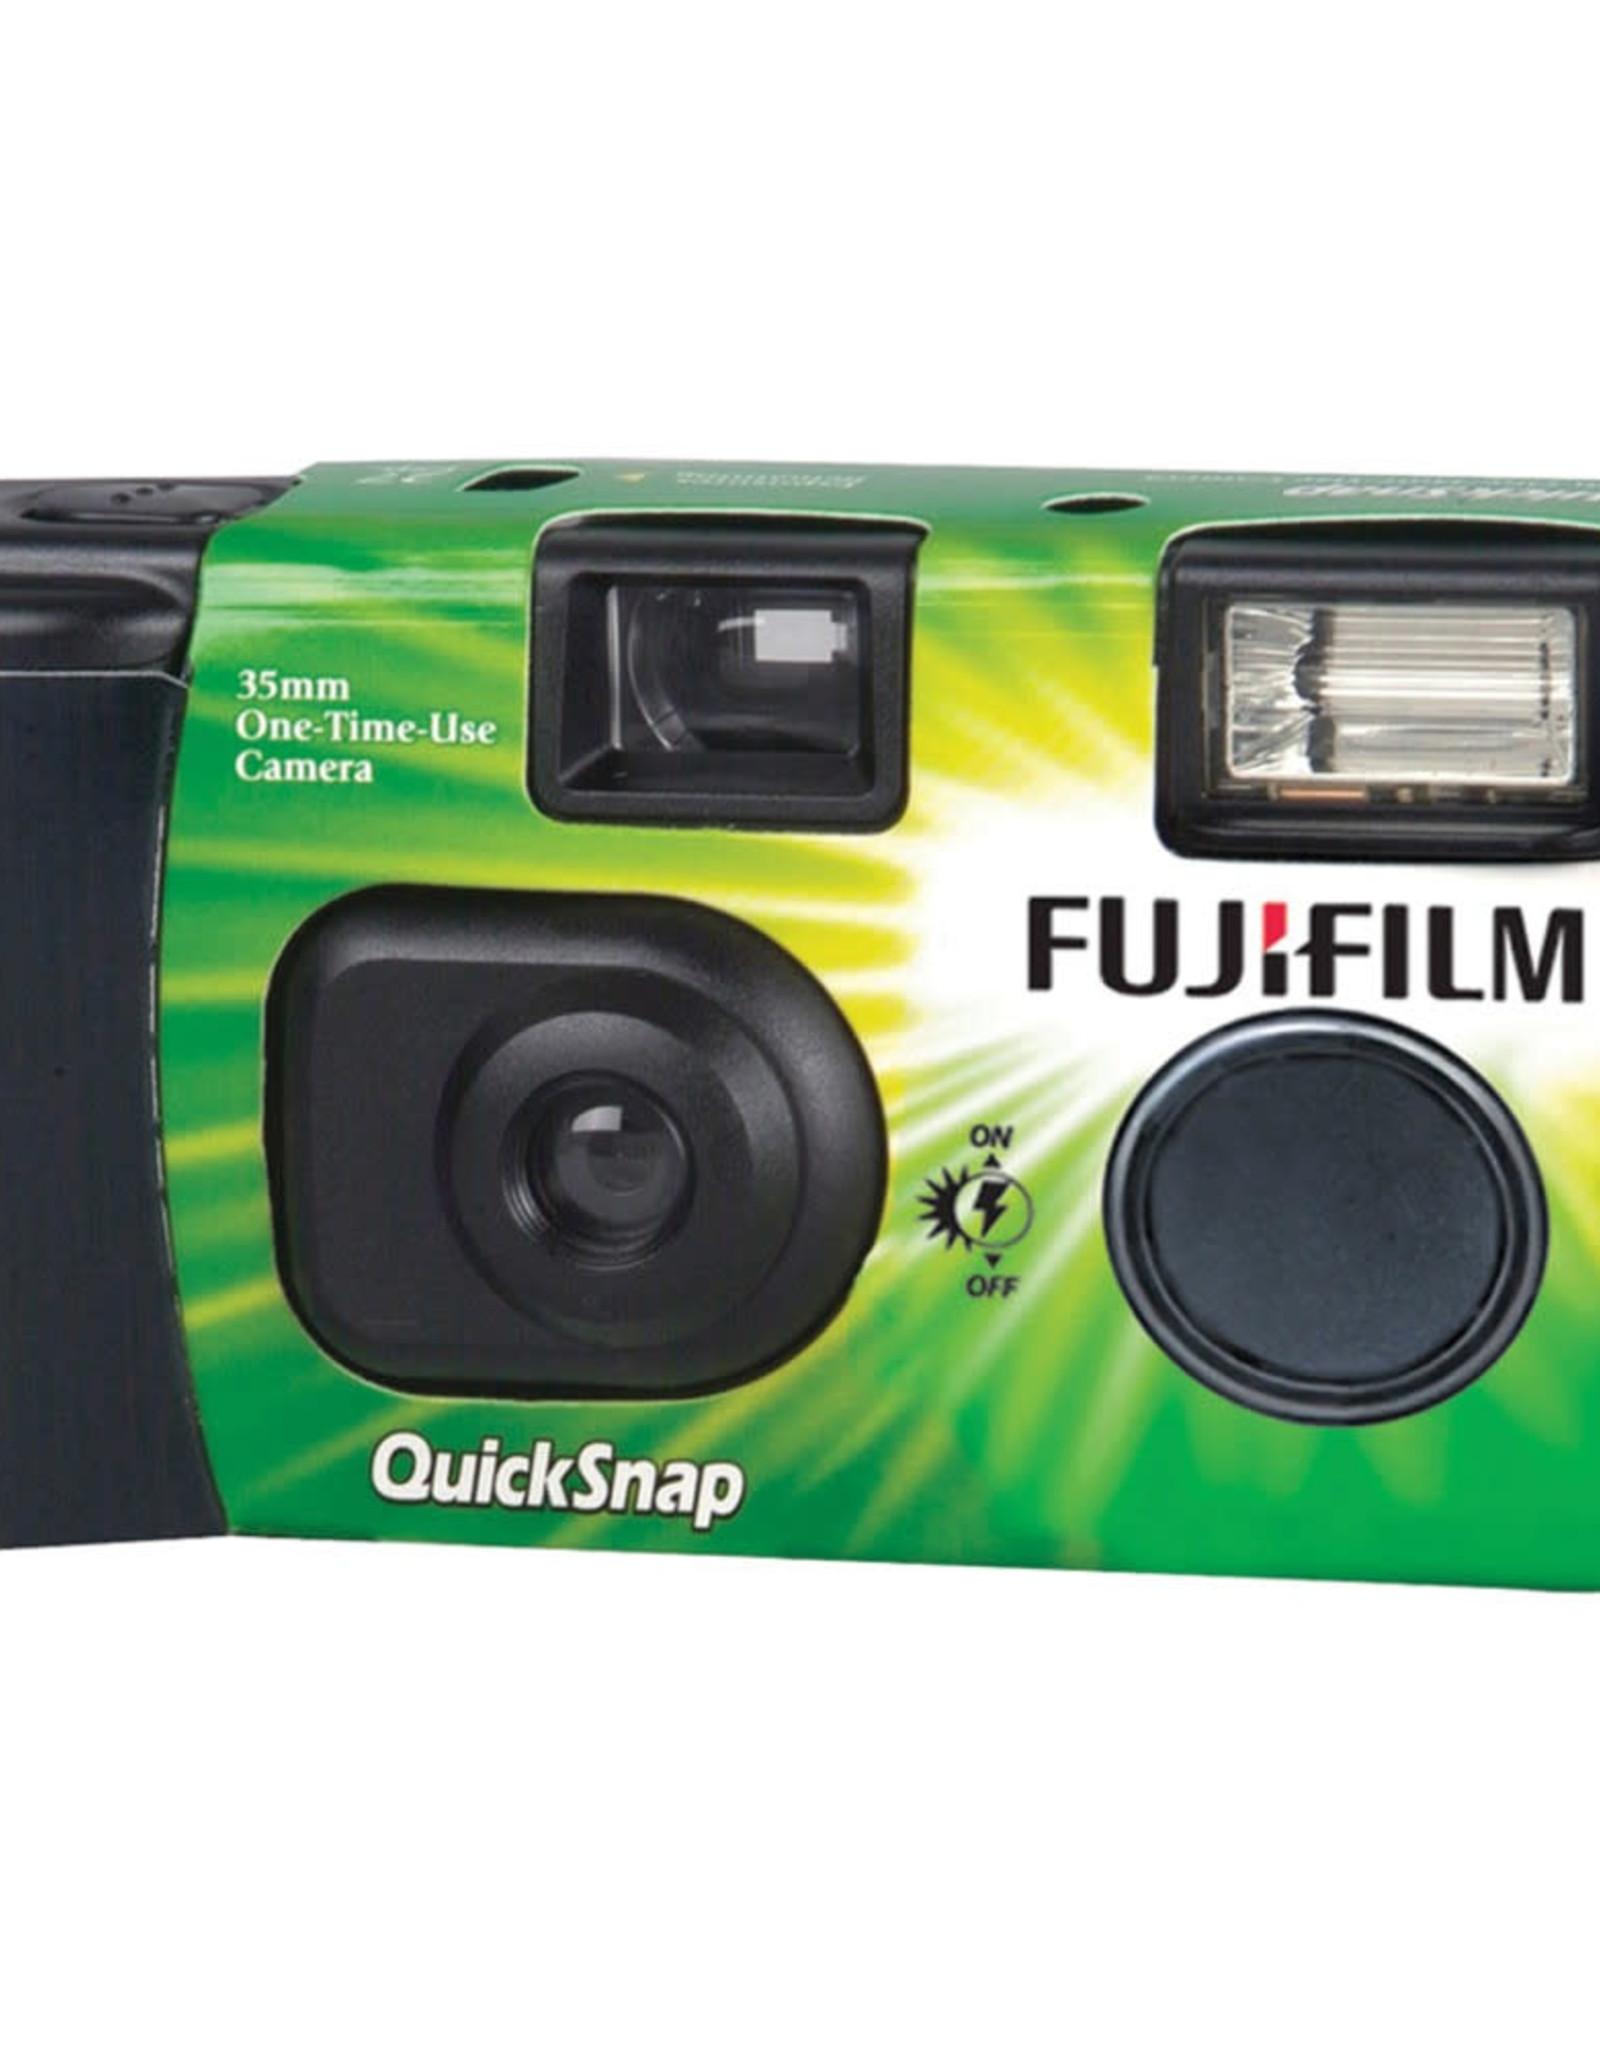 Fujifilm Fujifilm | Smile and Snap Flash 400  / 27 Single Use Camera 7042765